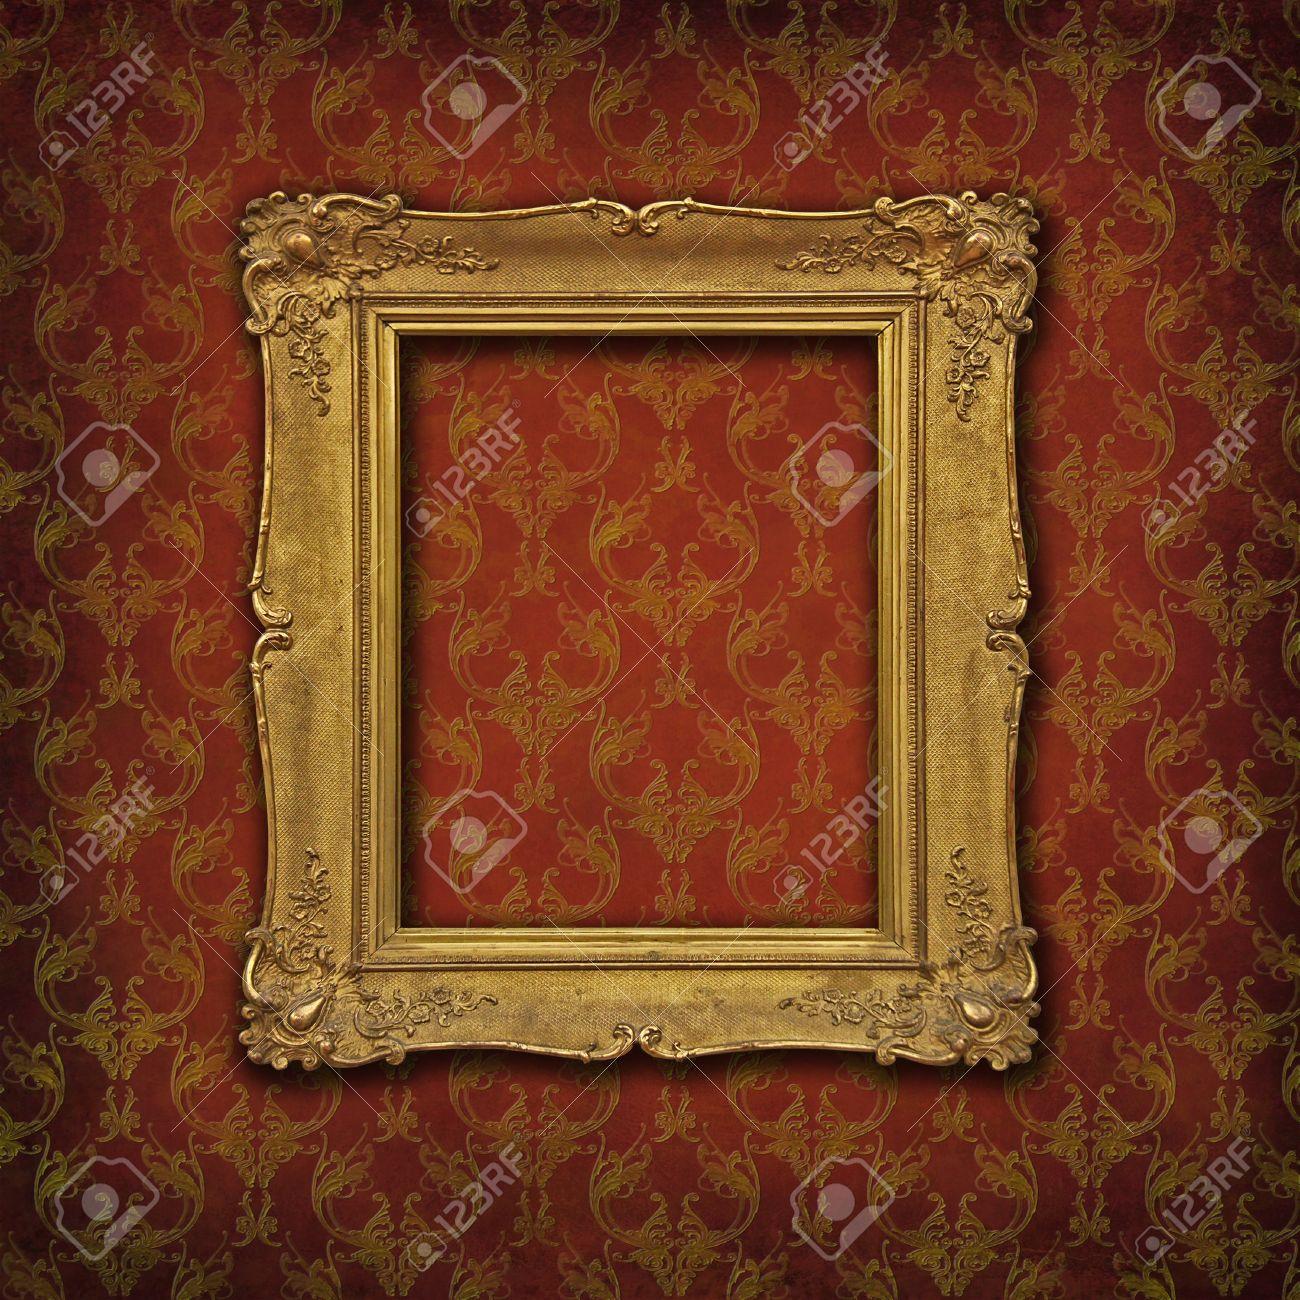 Golden Frame Wallpaper Empty Vintage Golden Frame on